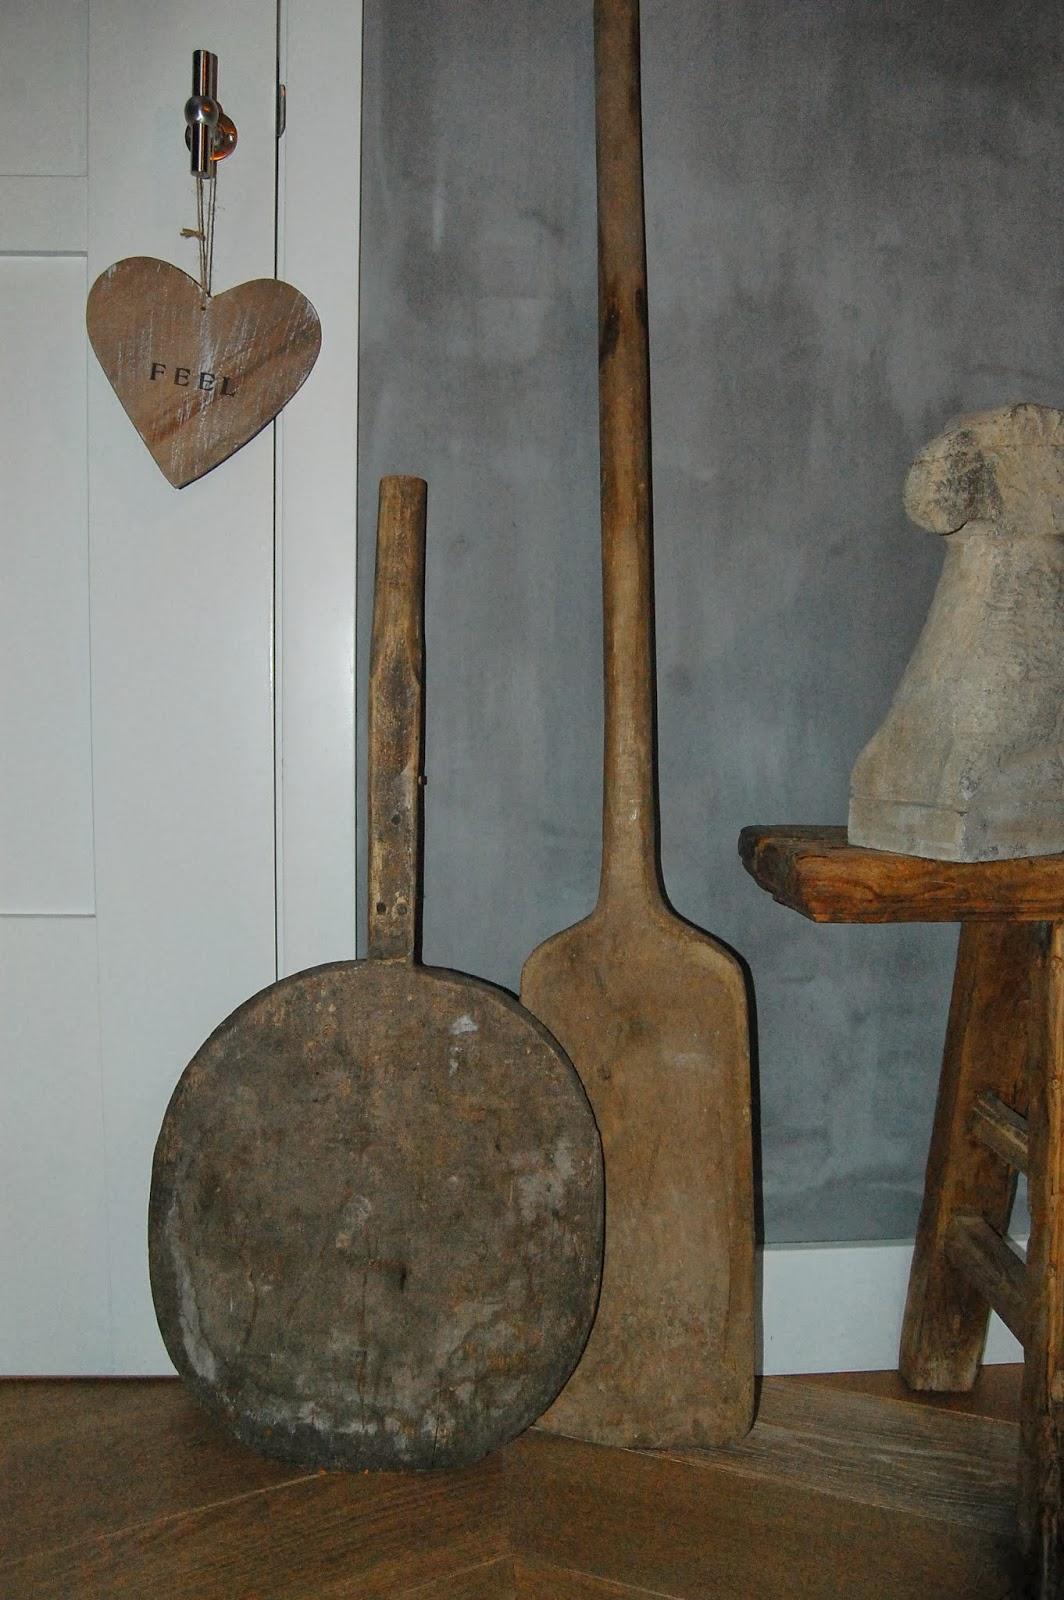 Oude Keuken Ophalen : oude houten ovenschep mooi stoer in de keuken